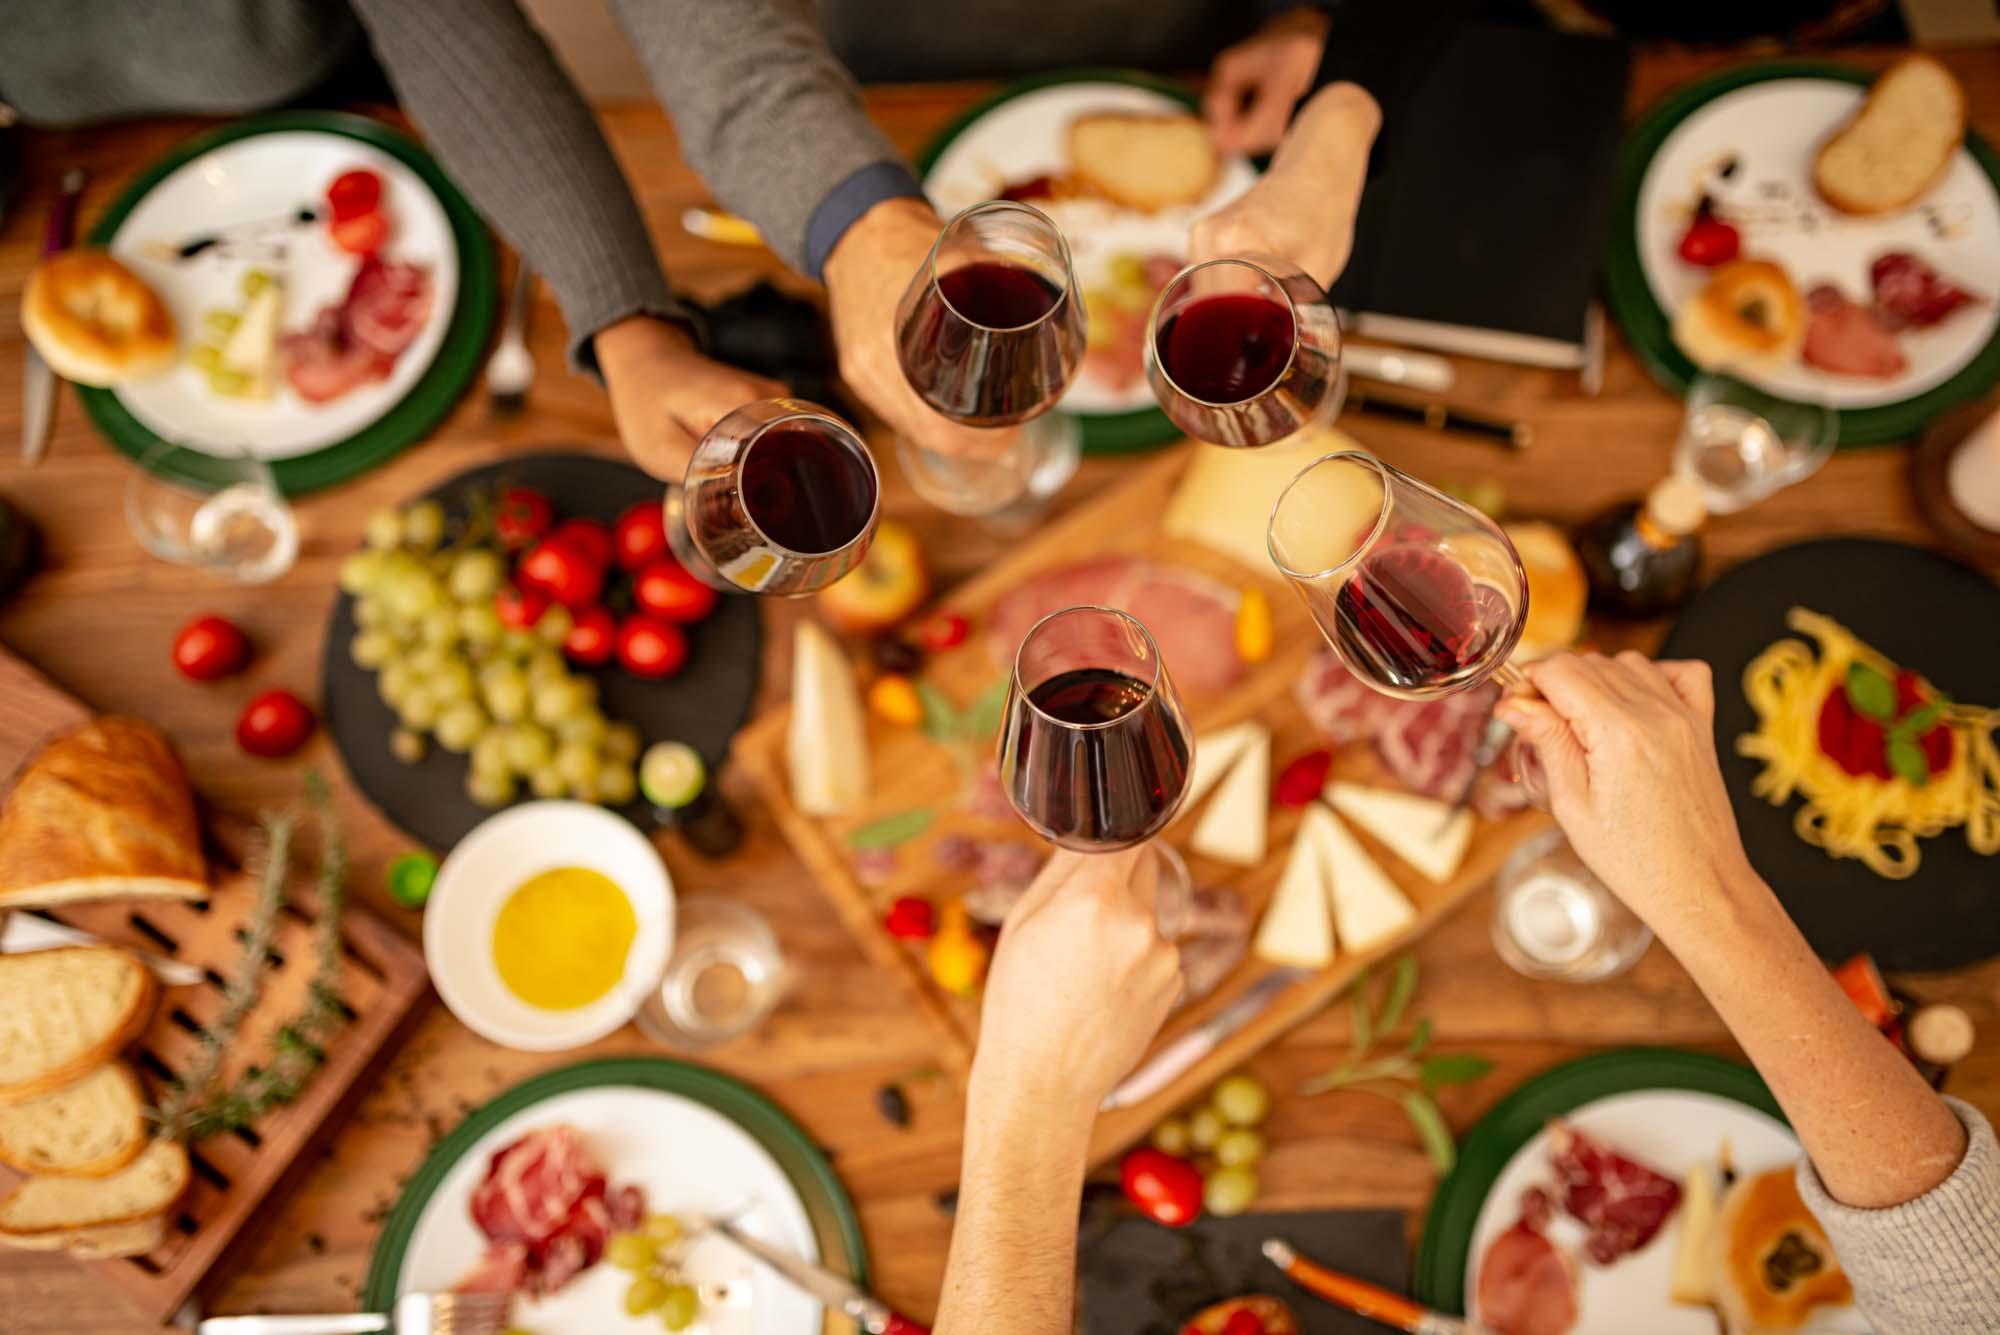 Cucina Amatoriale Cene Aziendali a Salerno